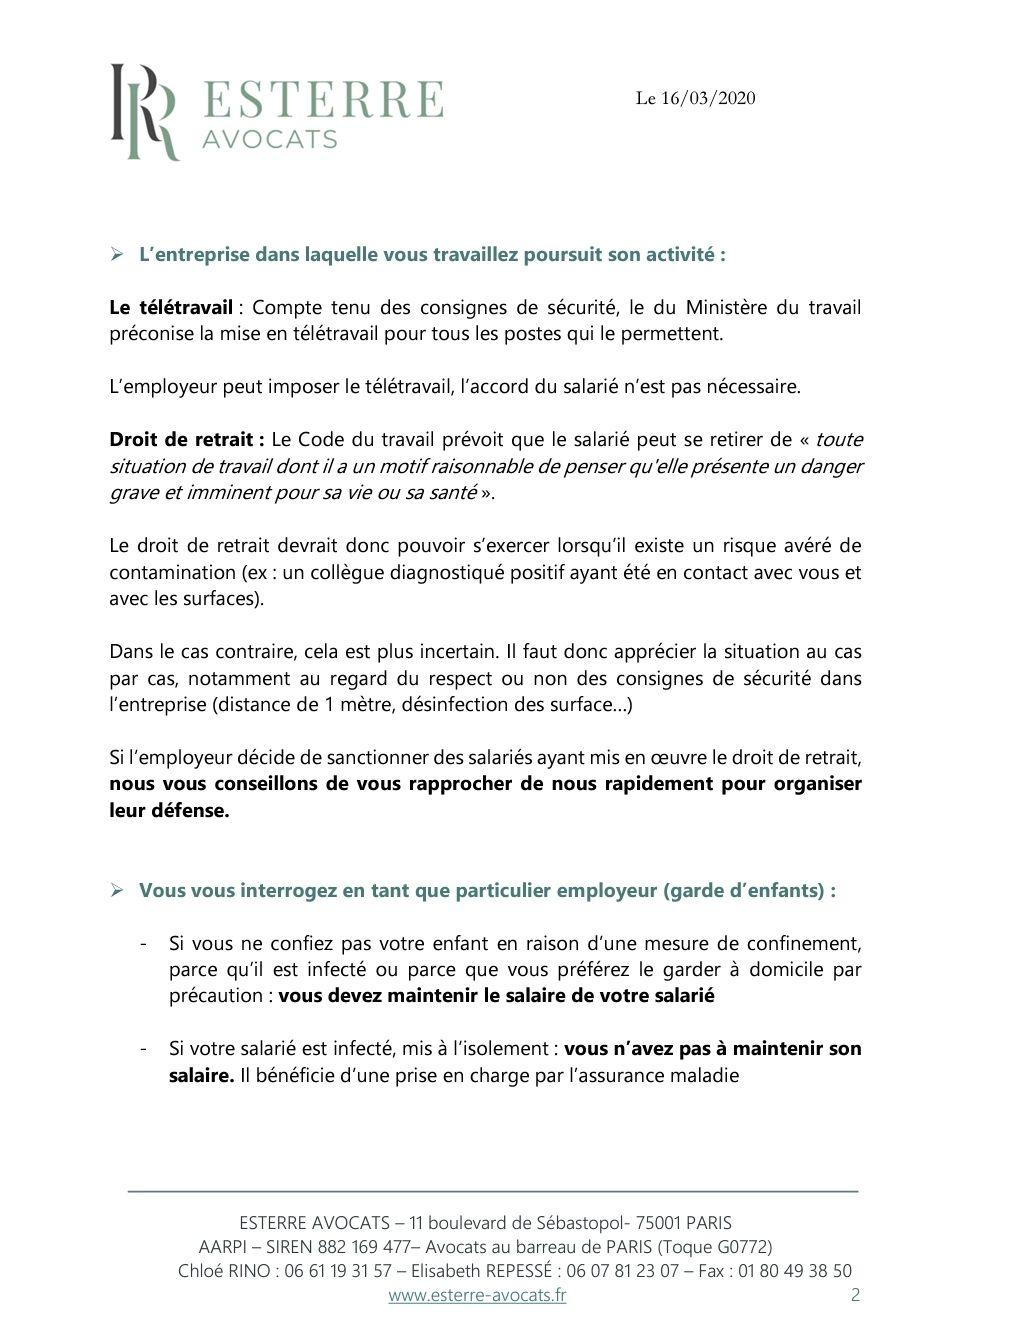 Note d'information - COVID 19 - ESTERRE AVOCAT-16 03 2020